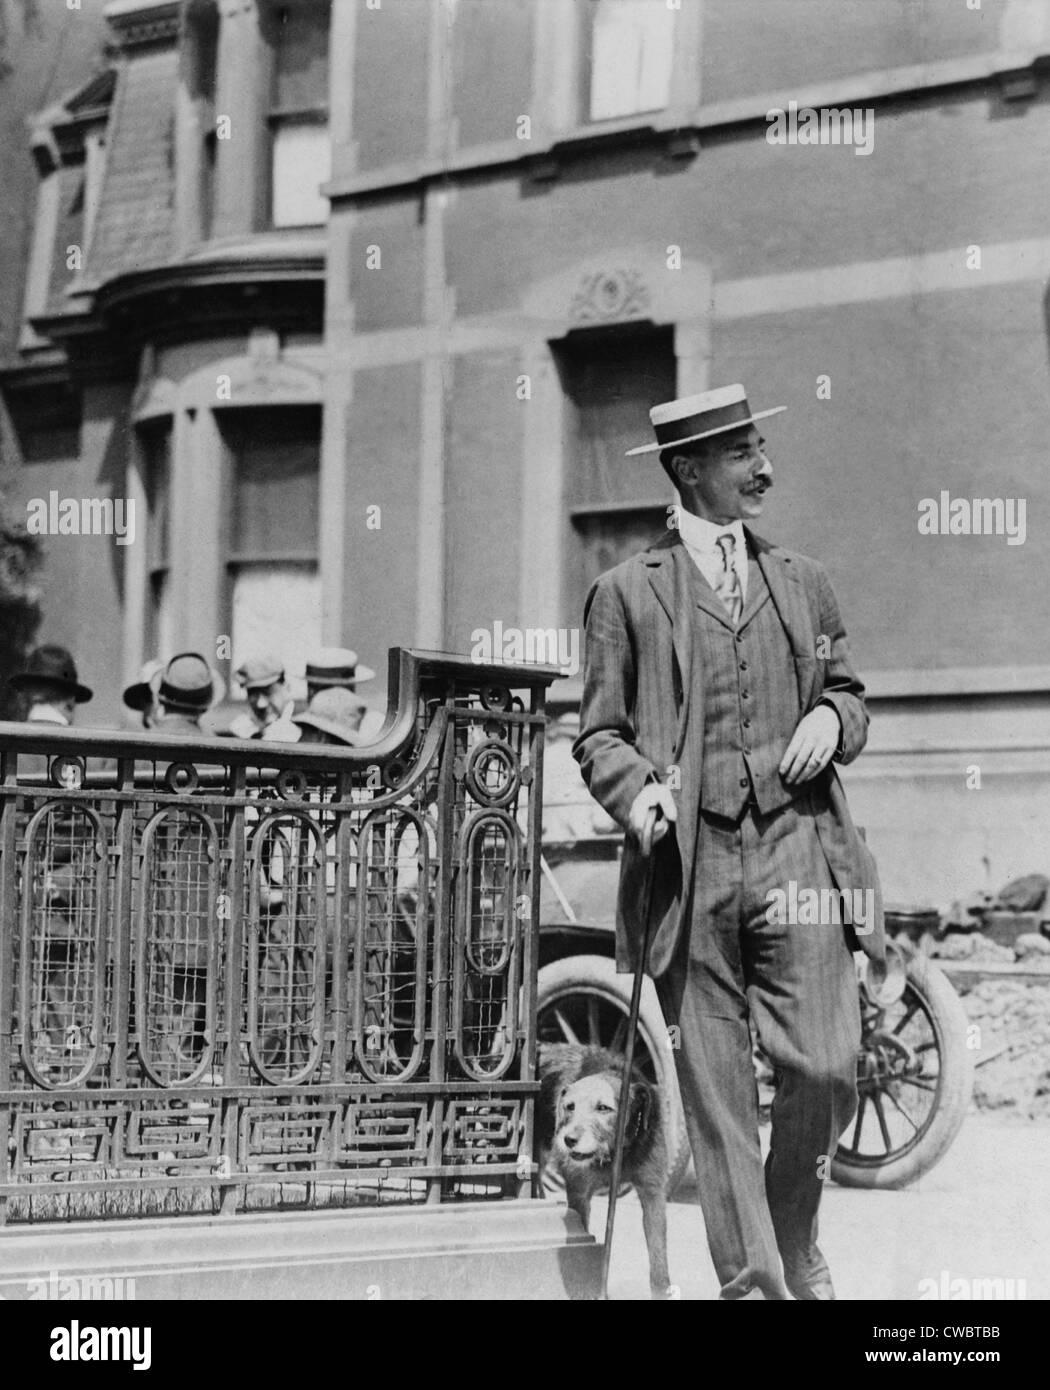 John Jacob Astor IV (1864-1912), pasear a su perro. Fue un aristócrata de talento que se dedican a actividades Imagen De Stock